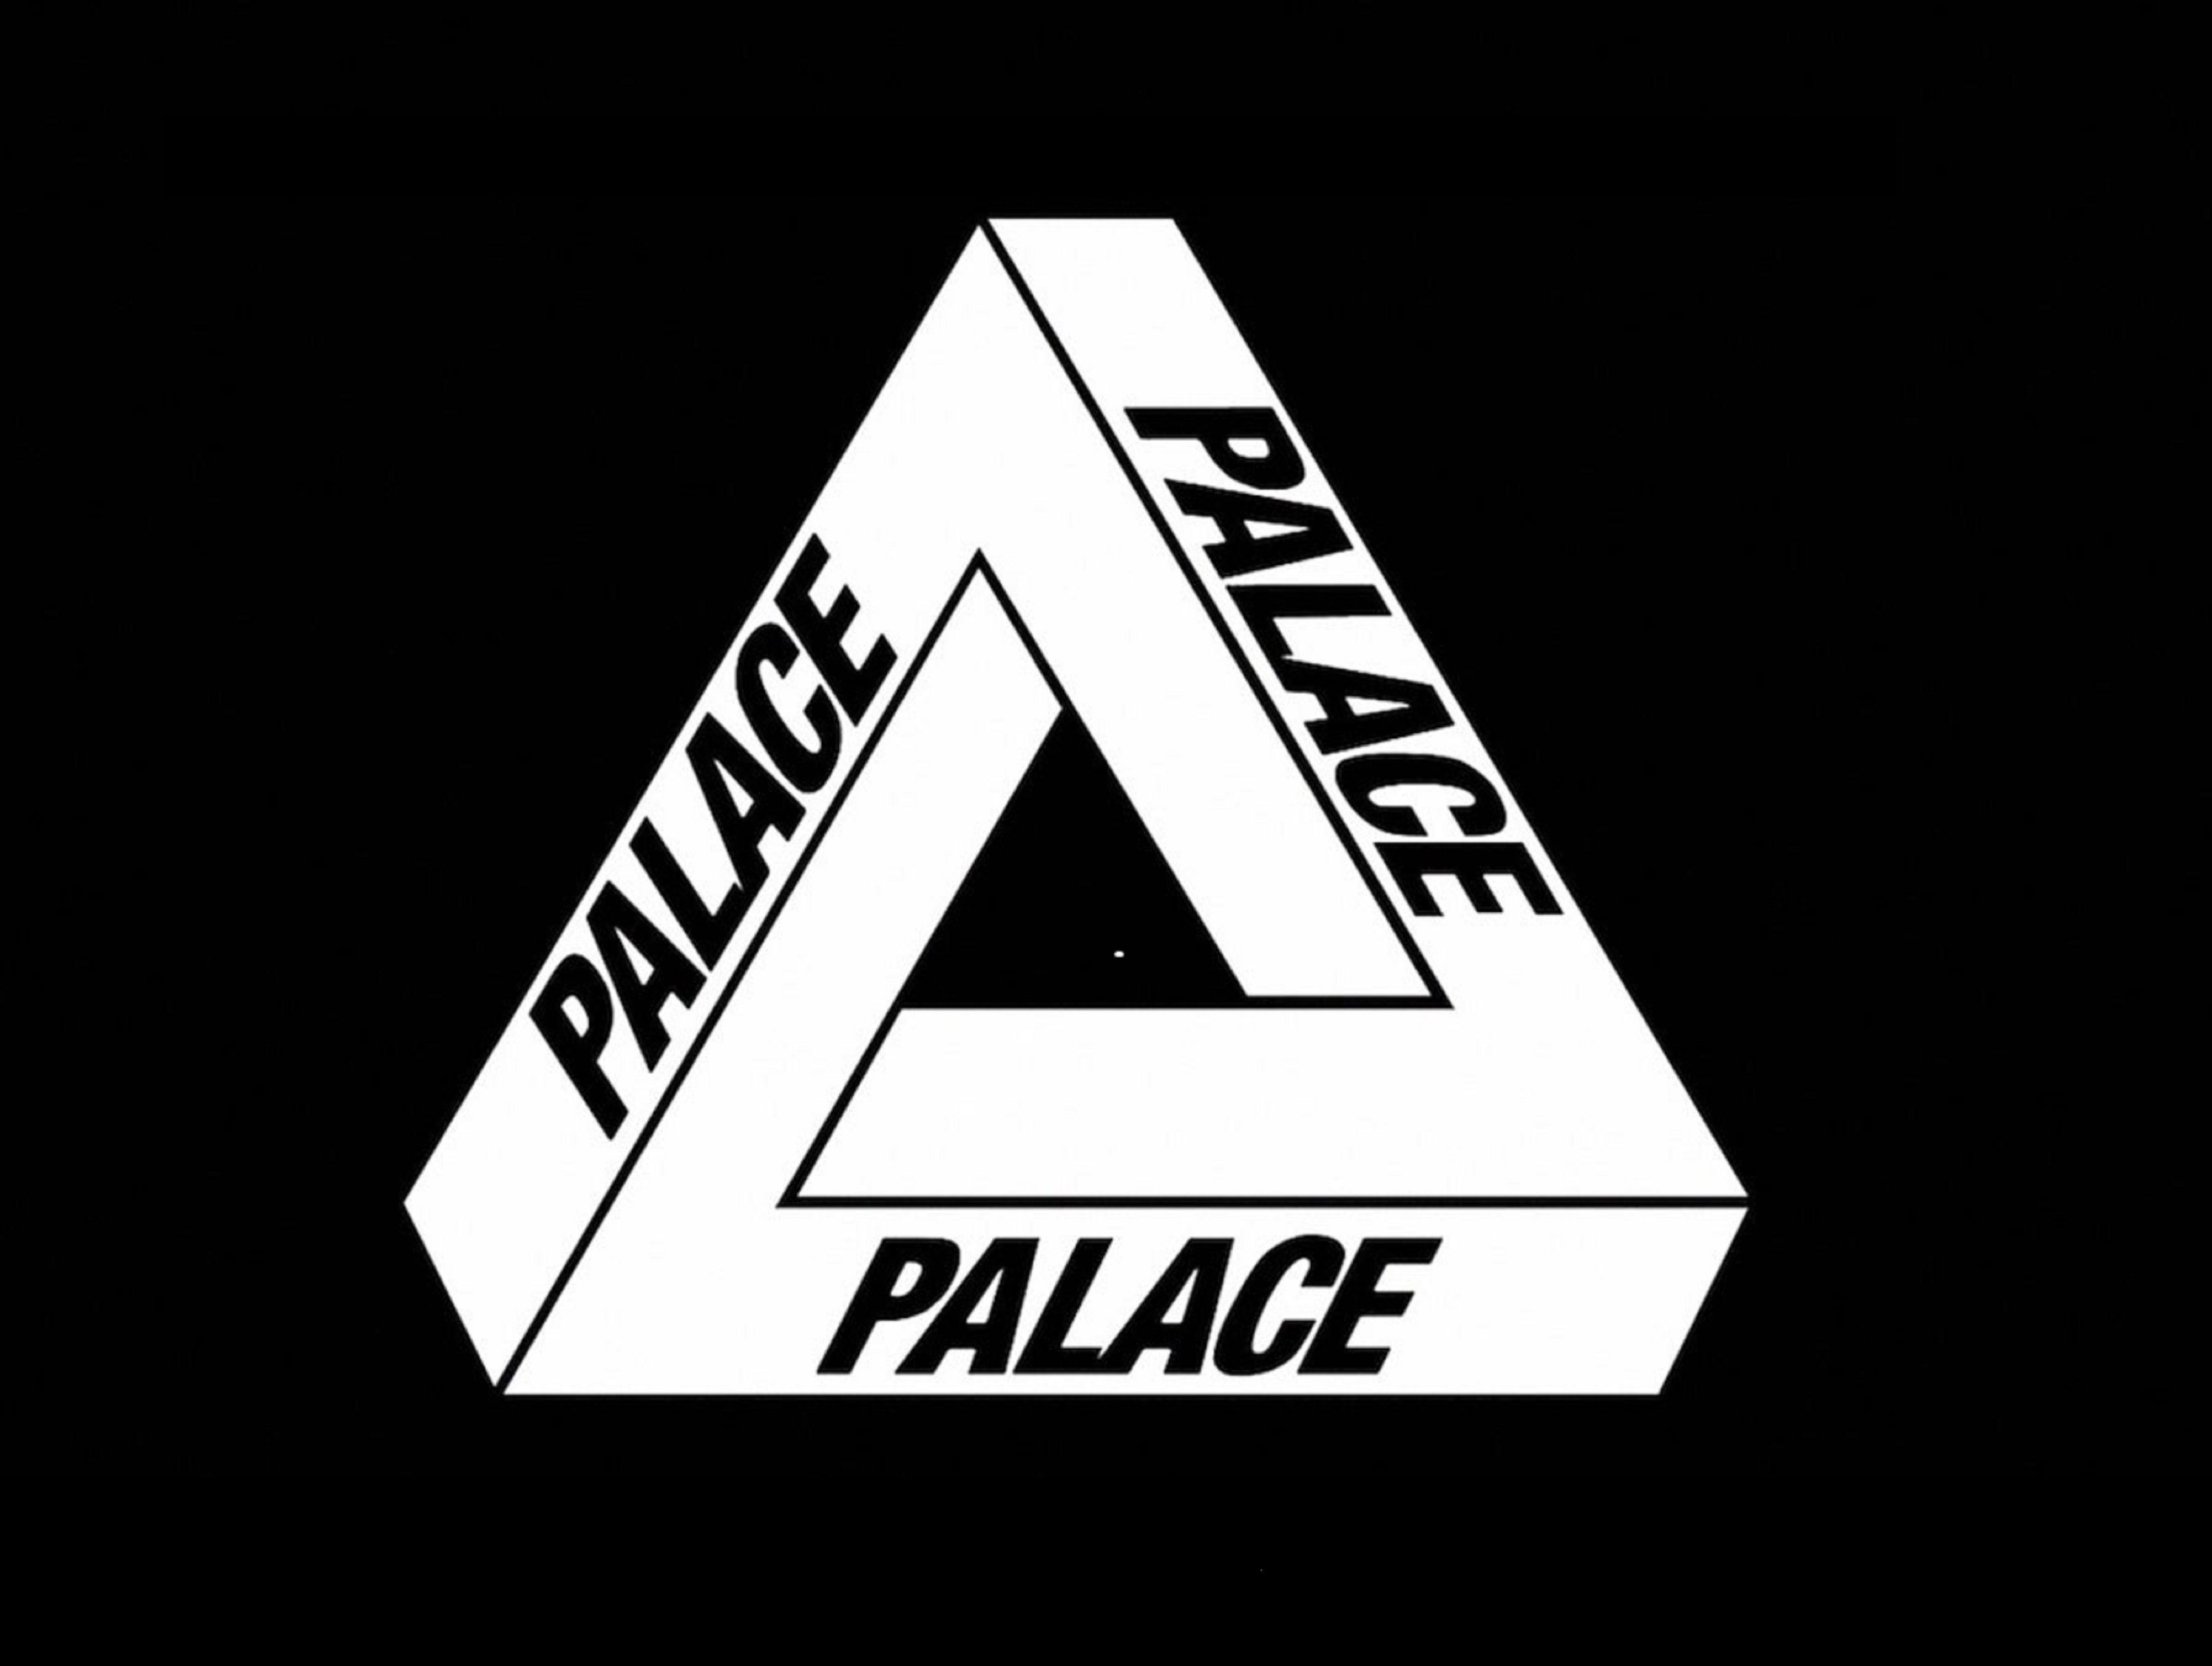 PALACE SUMMER 20 DOSKY SÚ ONLINE